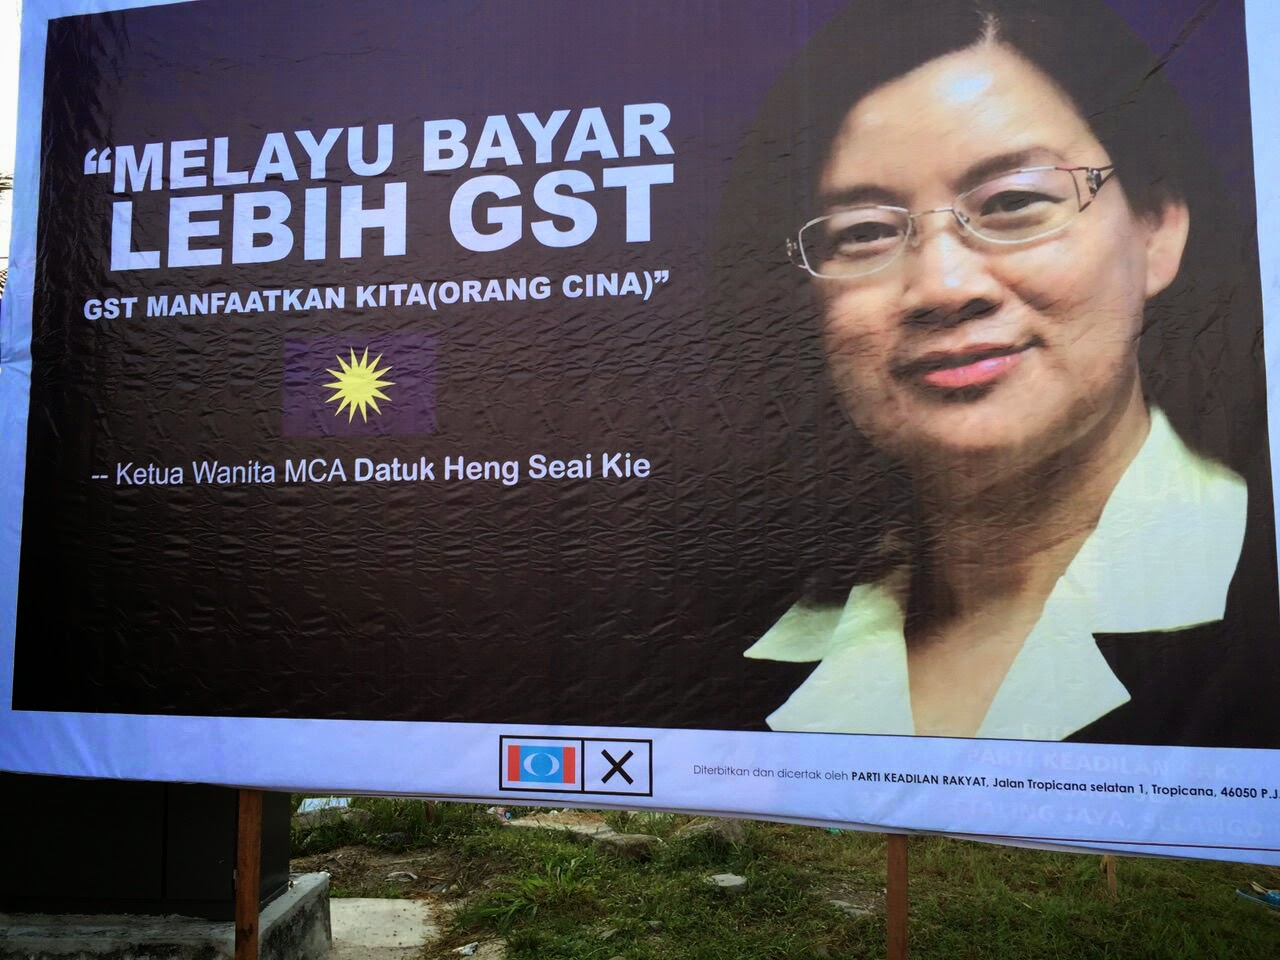 Pakatan Mula Panas Punggung PRKPermatangPauh Turunkan Billboard Fitnah MCA